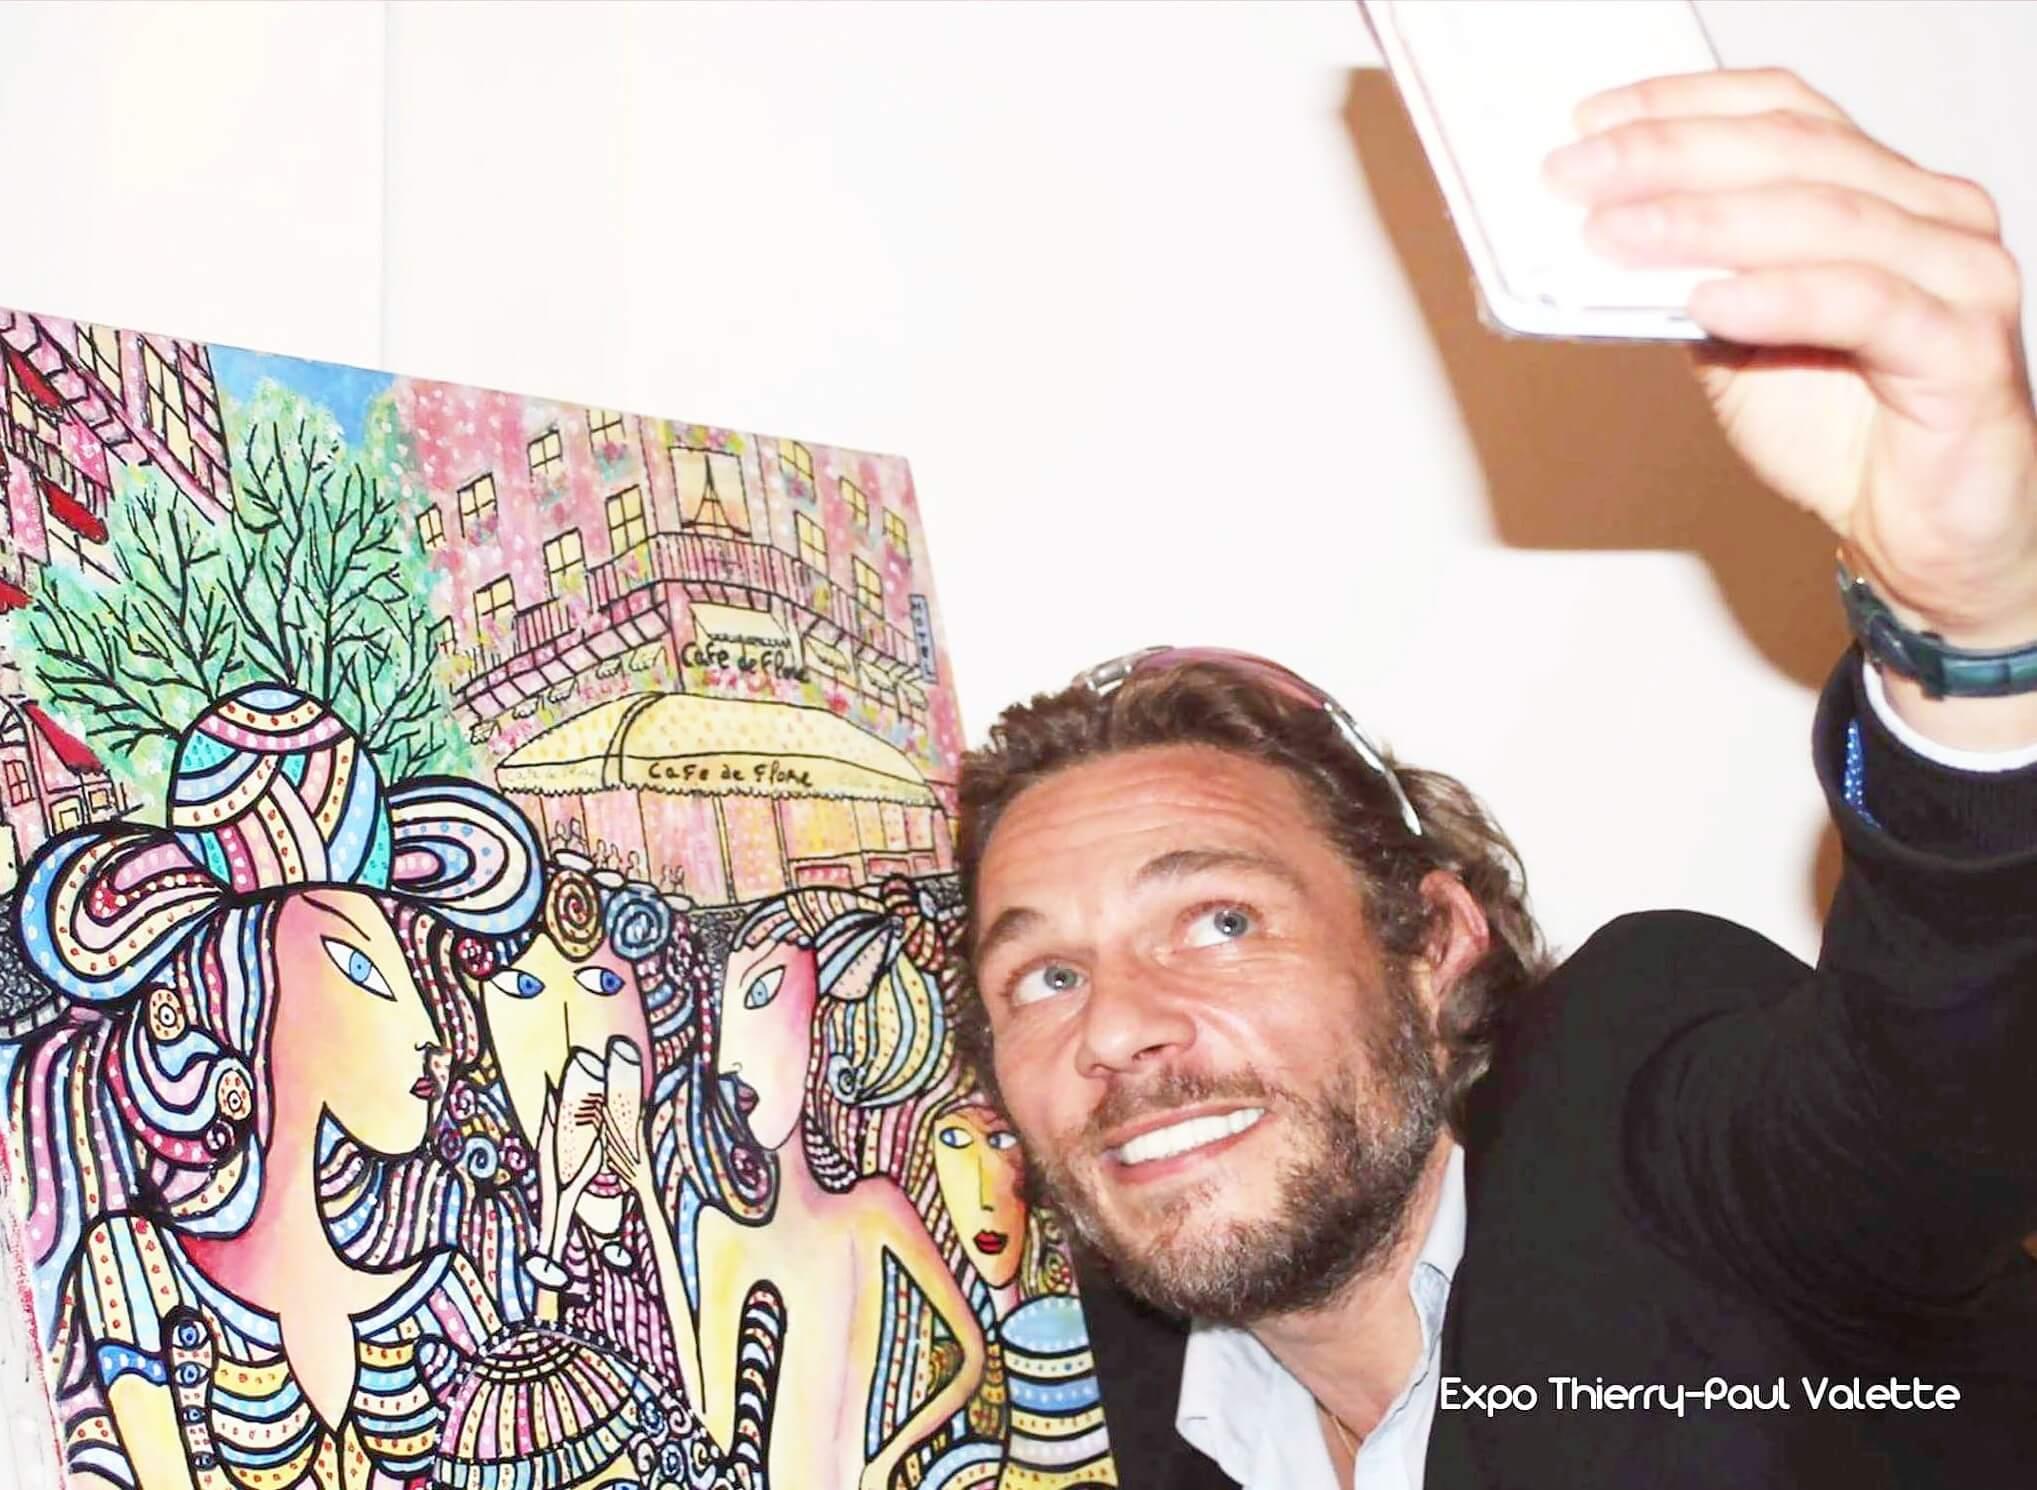 thierry-paul-valette-artistejournee-mondiale-du-selfie-utile